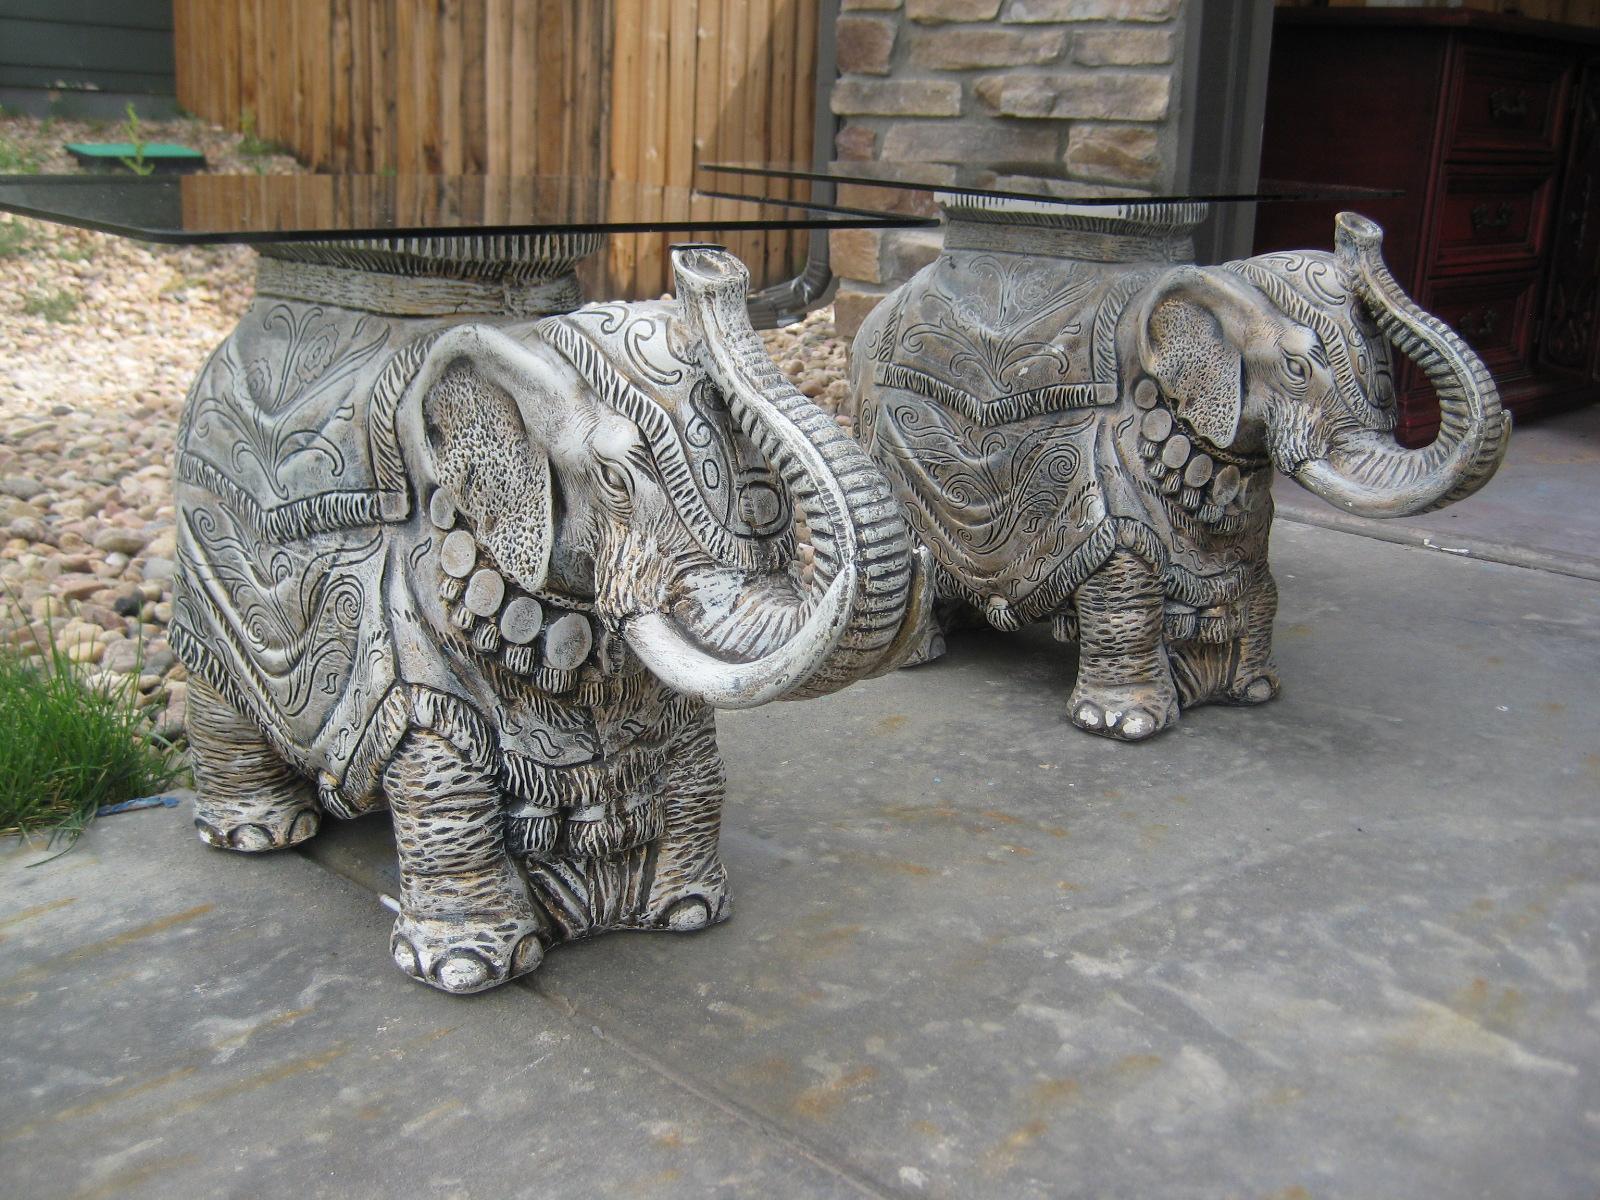 Vintage Elephant End Tables   $100 Each Obo